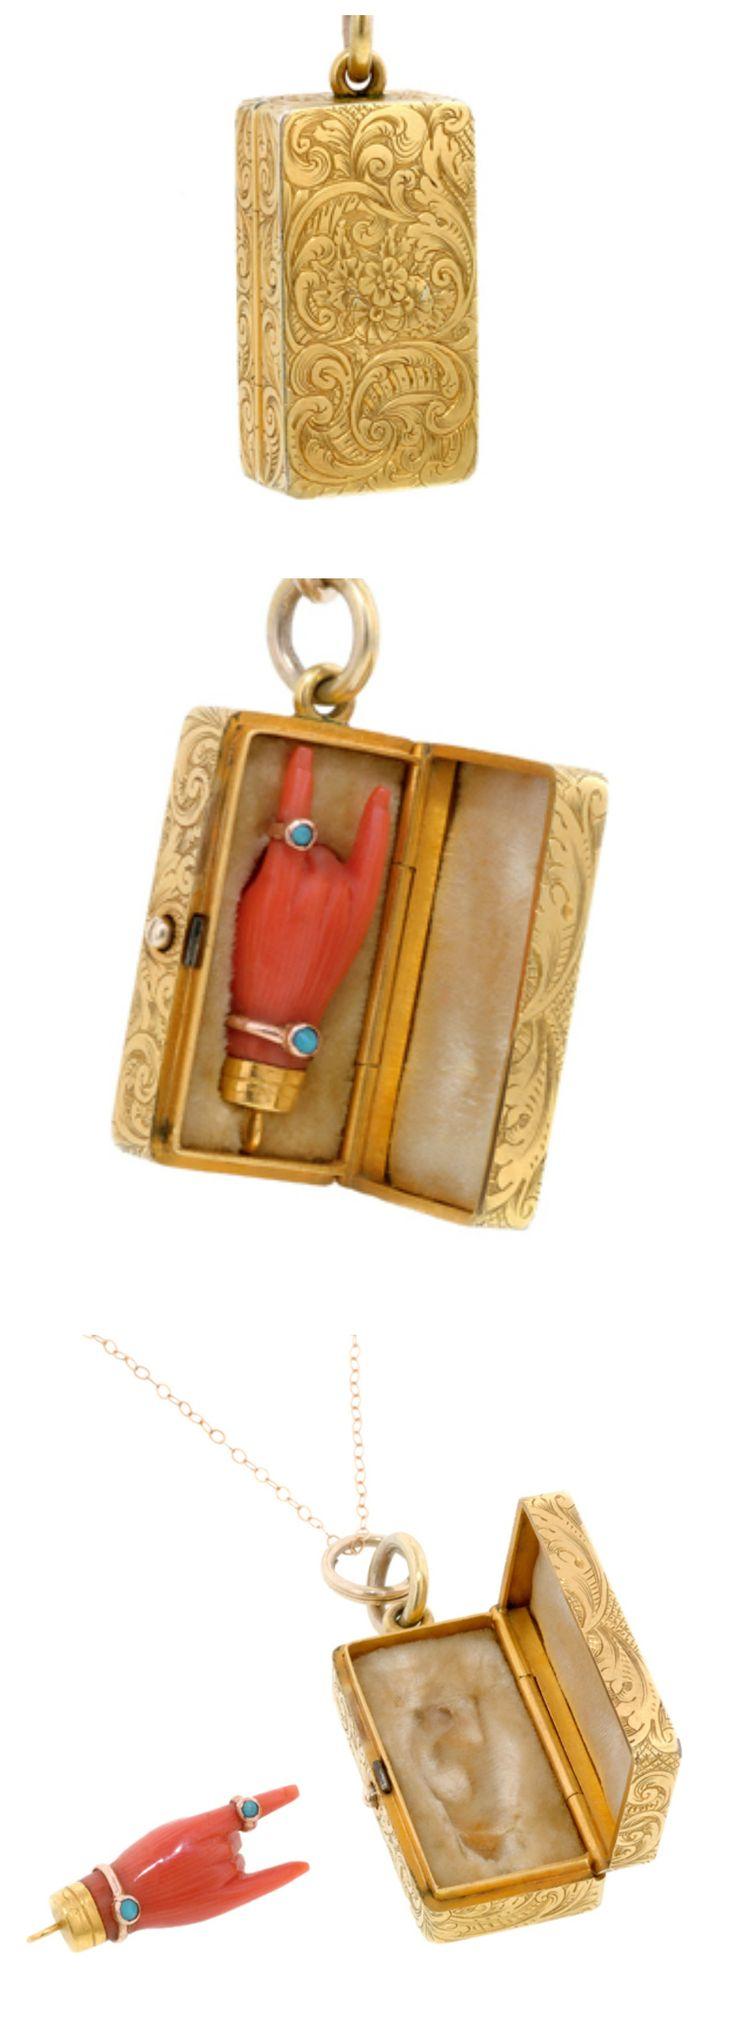 best acessories images on pinterest charm bracelets jewelery